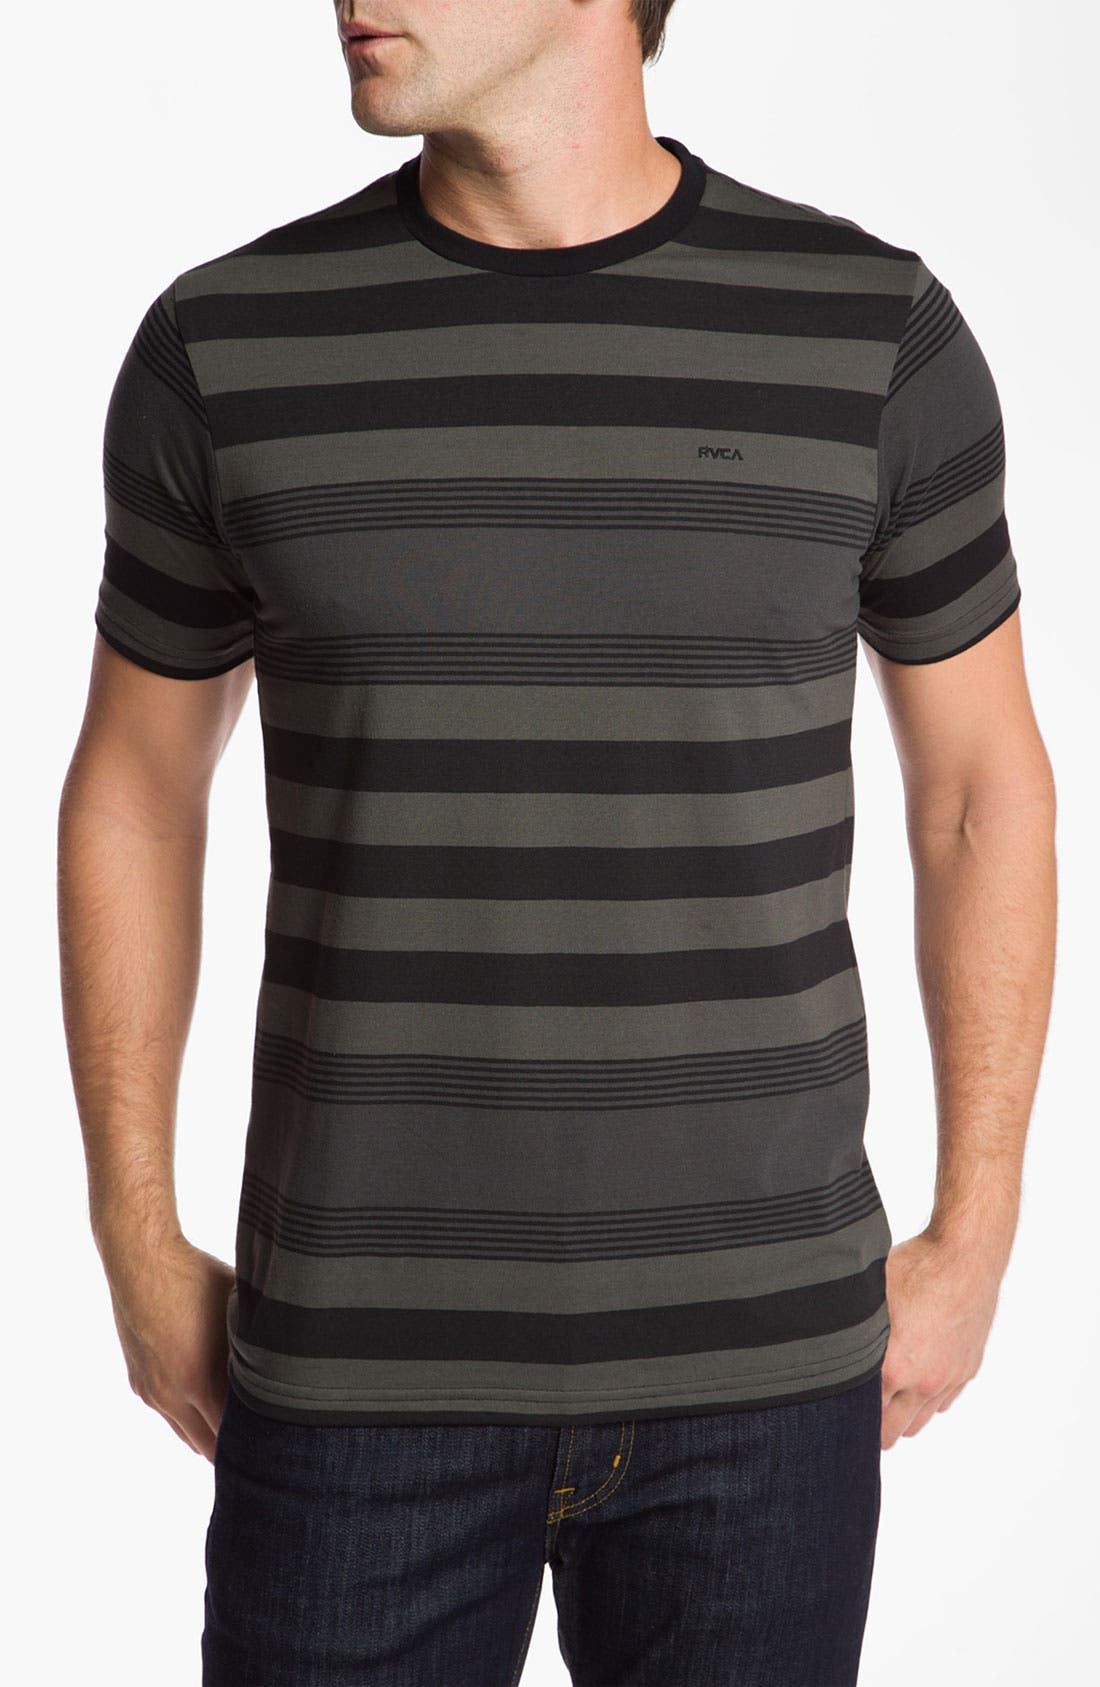 Alternate Image 1 Selected - RVCA 'Kona' T-Shirt